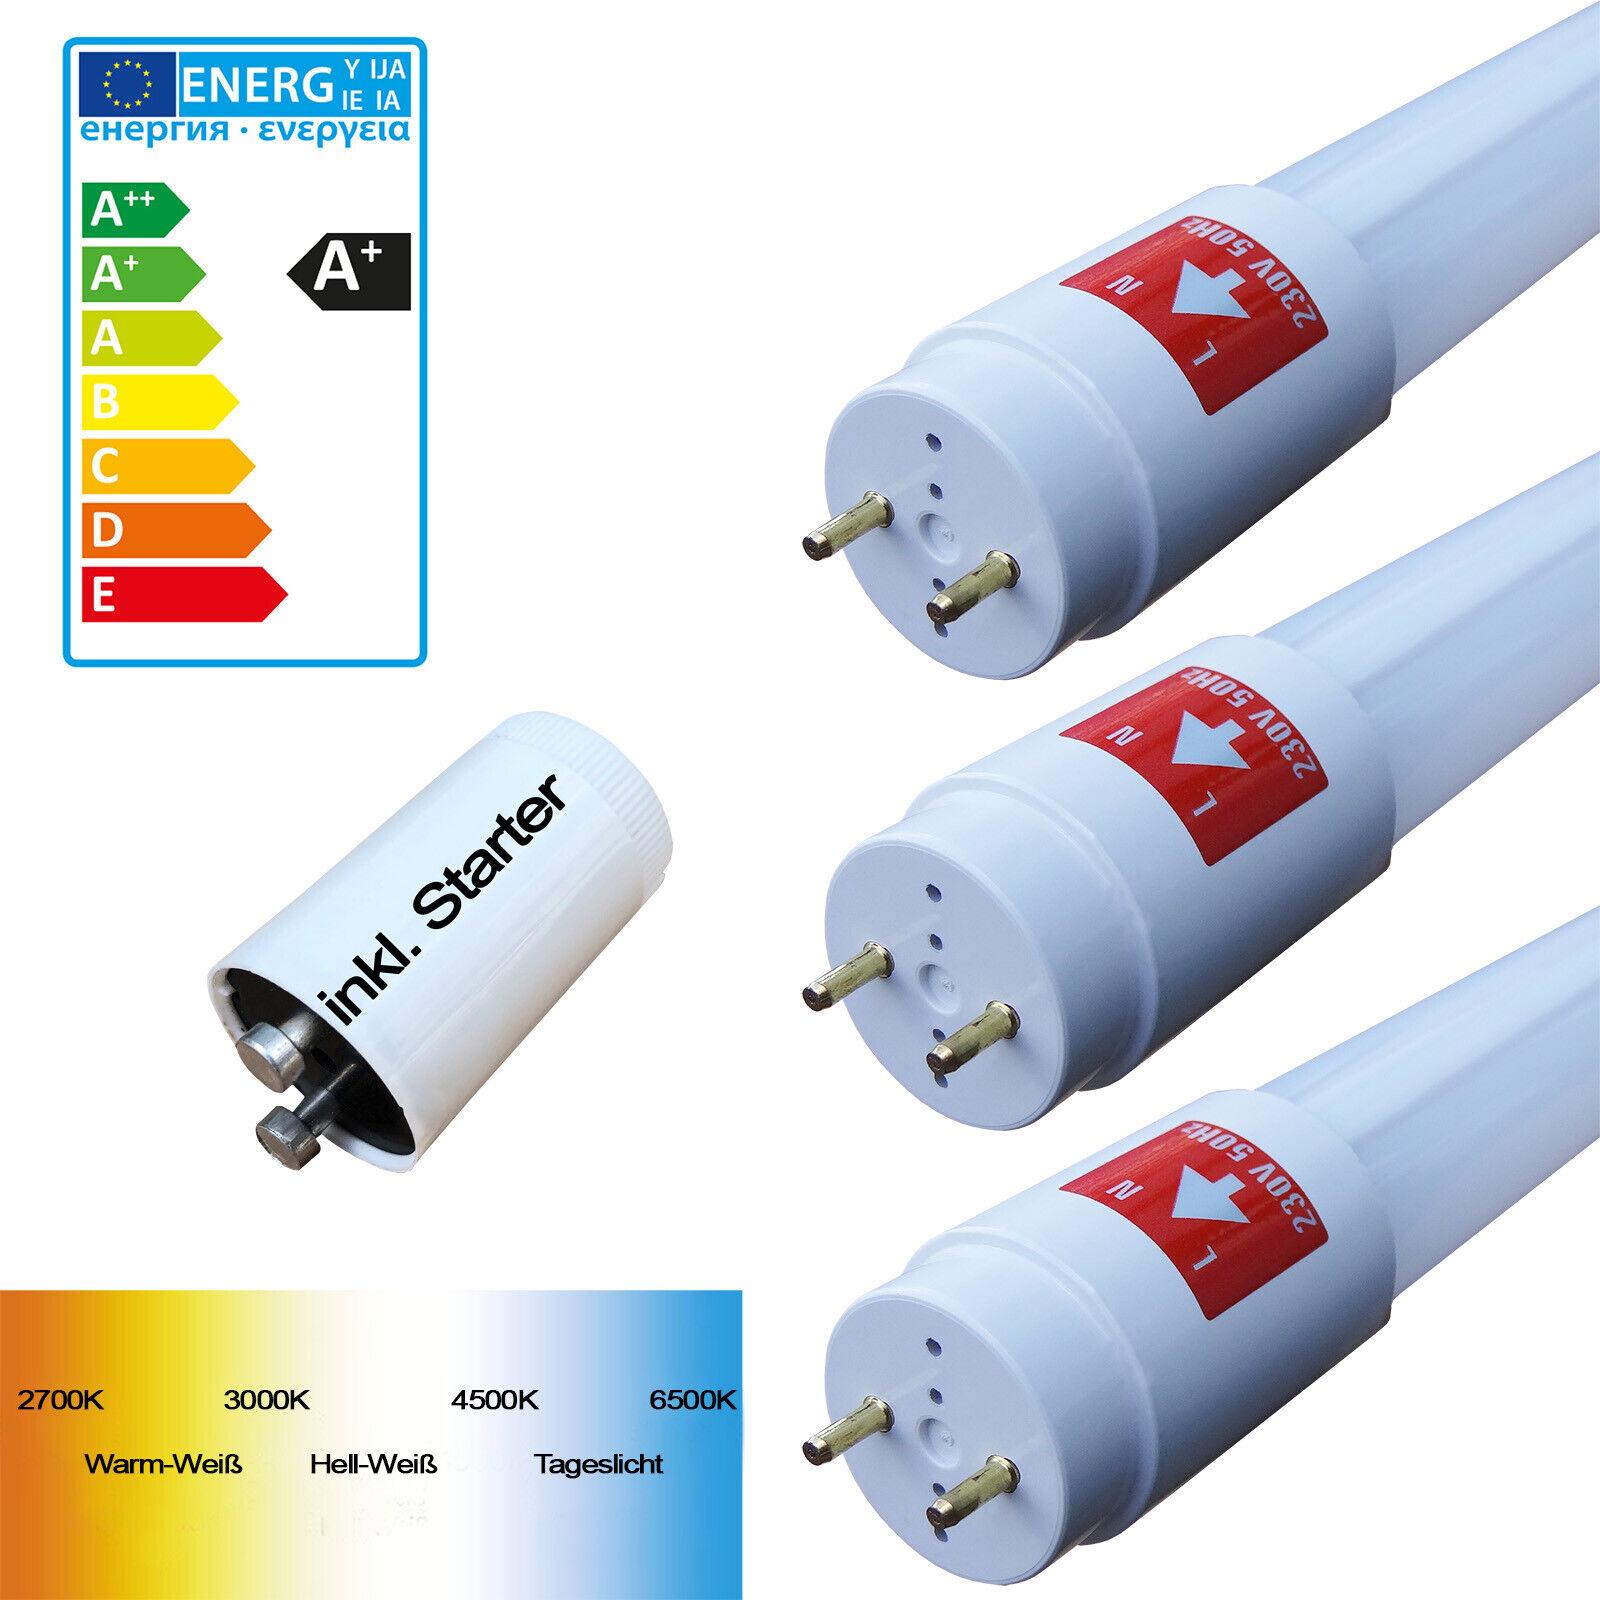 LED Röhre T8 G13 60 120 150cm Leuchtstoffröhre Tube Neonröhre Leuchte 10W - 24W